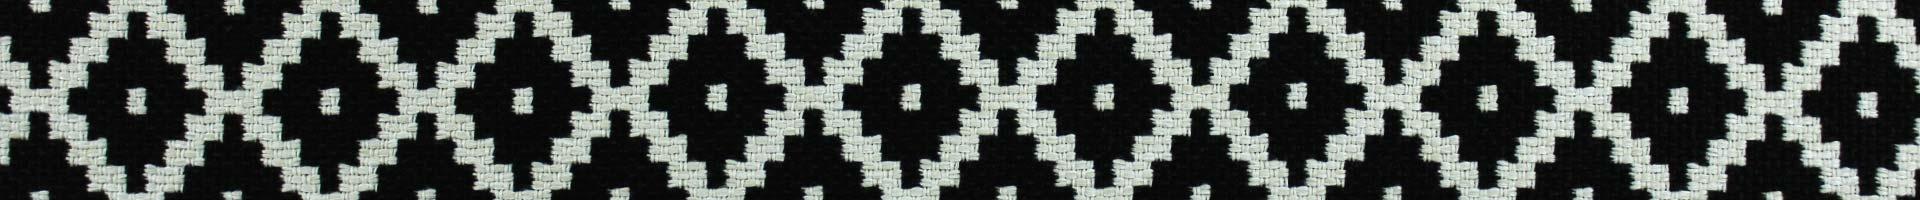 Outdoor fabrics 100% Dyed Acrylic